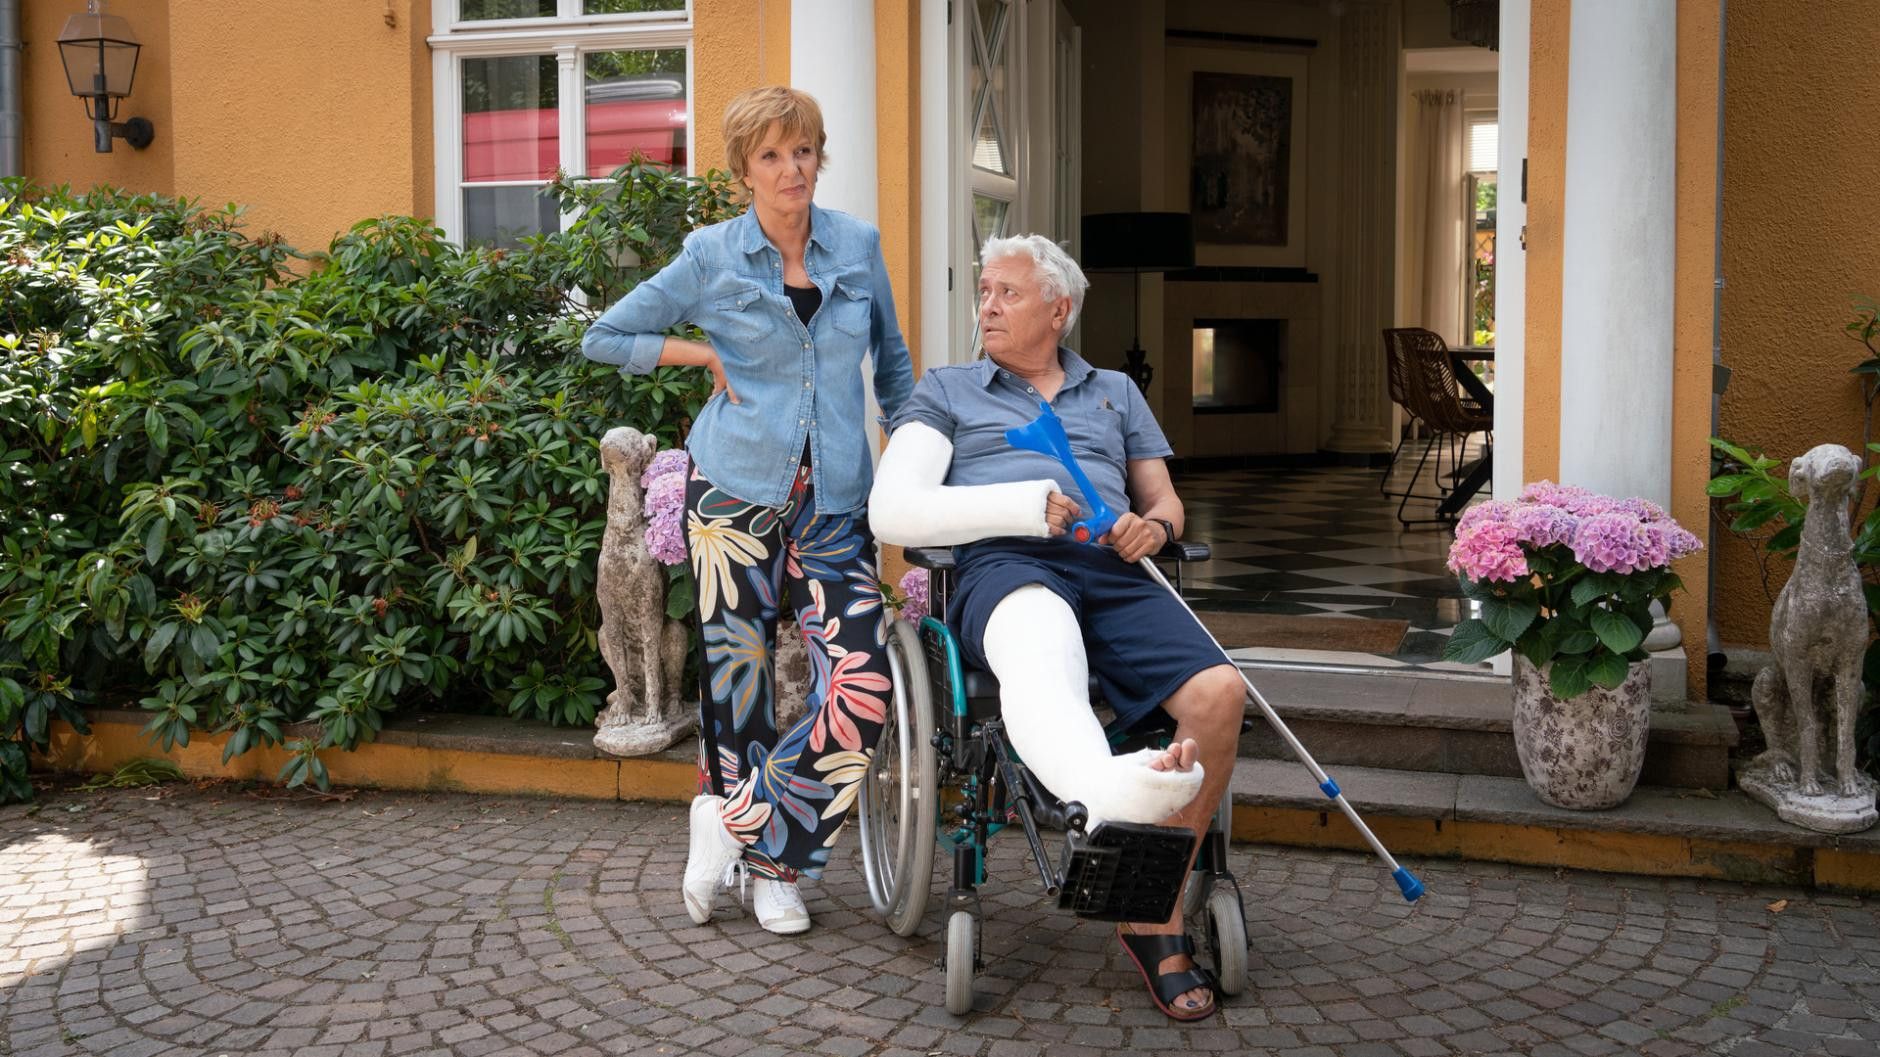 Wir bleiben Freunde - am 23.5.21 im ZDF: TV-Termin